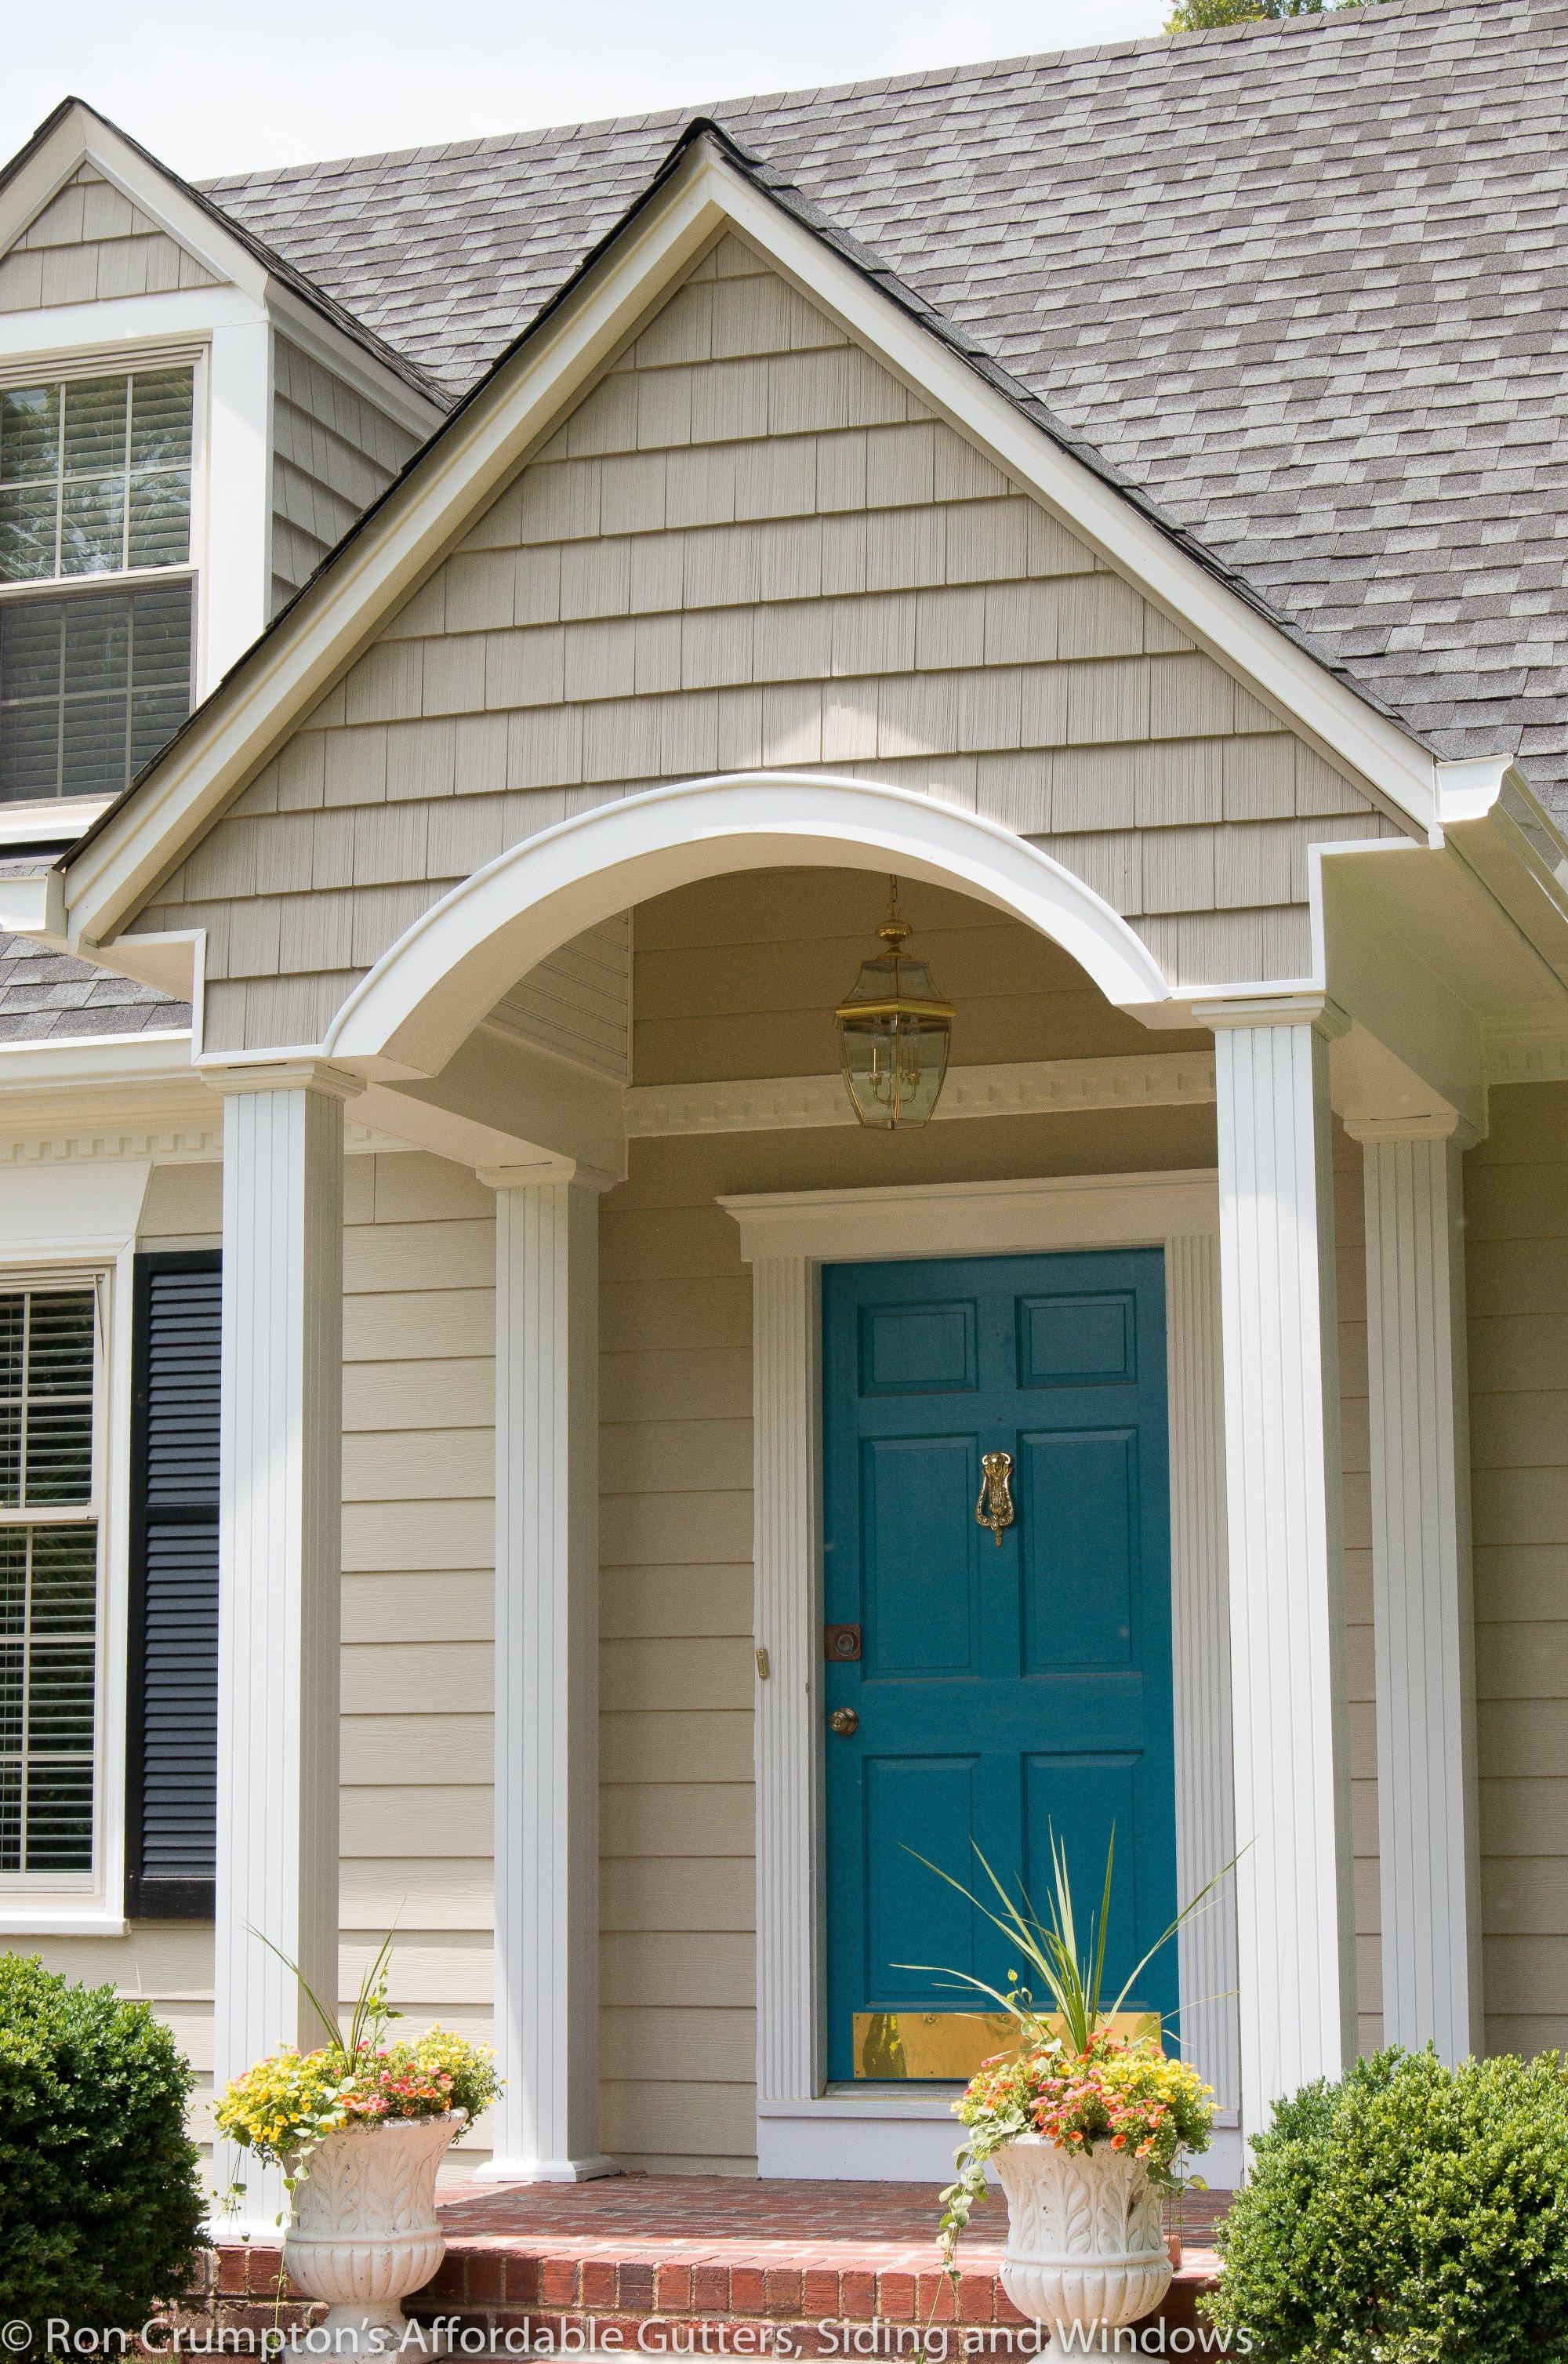 Lonestar Siding Amp Windows In Richmond Va 23228 Citysearch